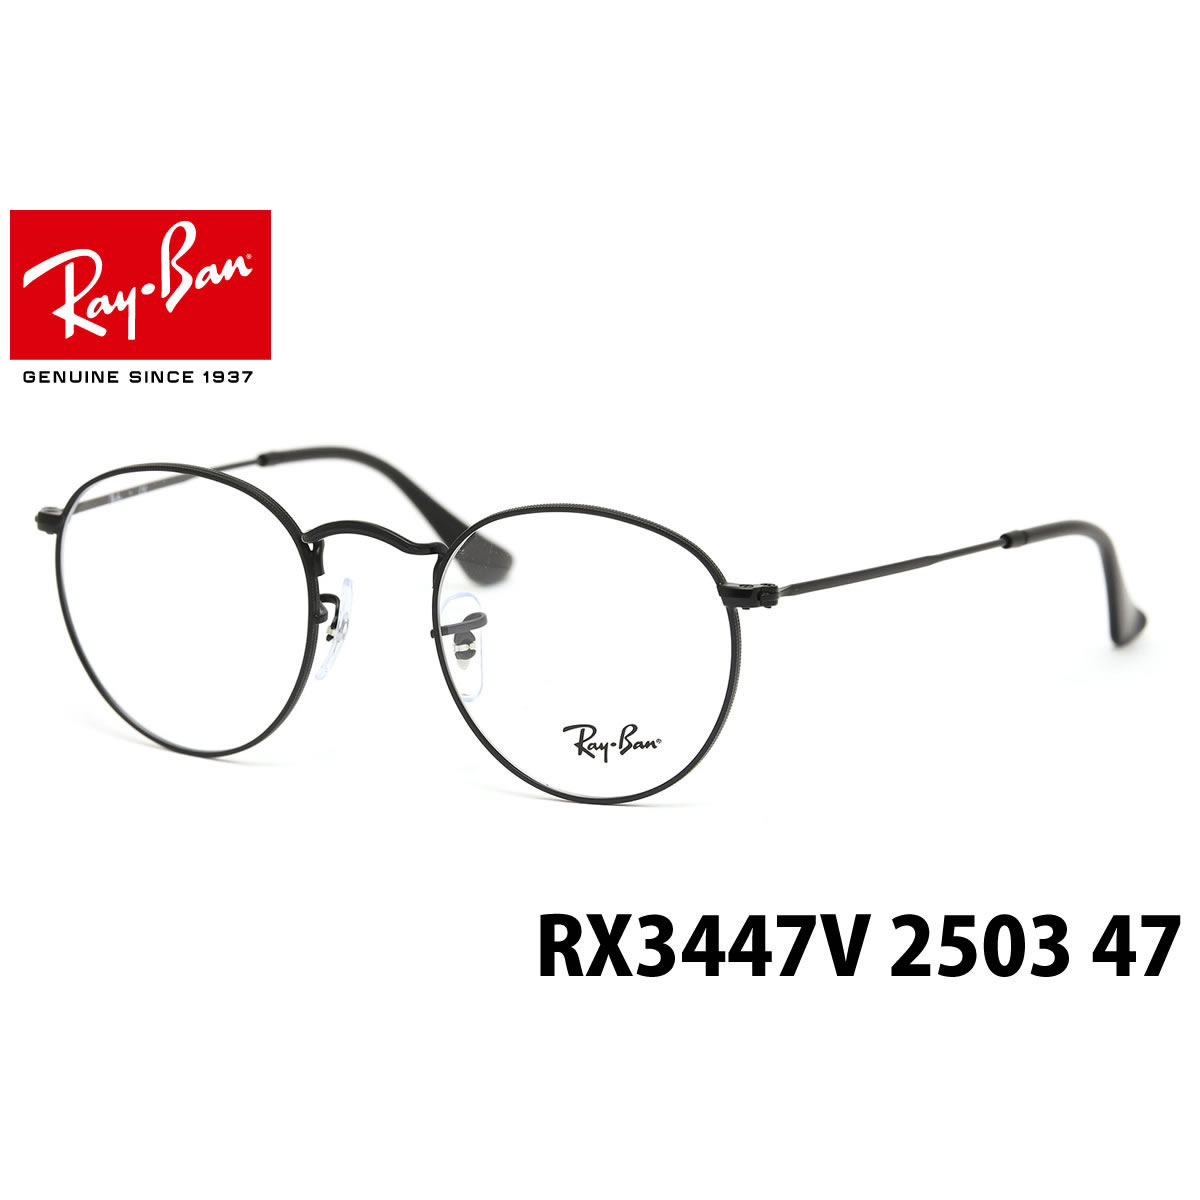 beb53631e07 ... free shipping ray ban round metal eyeglasses frame rx3447v6503 47 size round  round glasses round ray